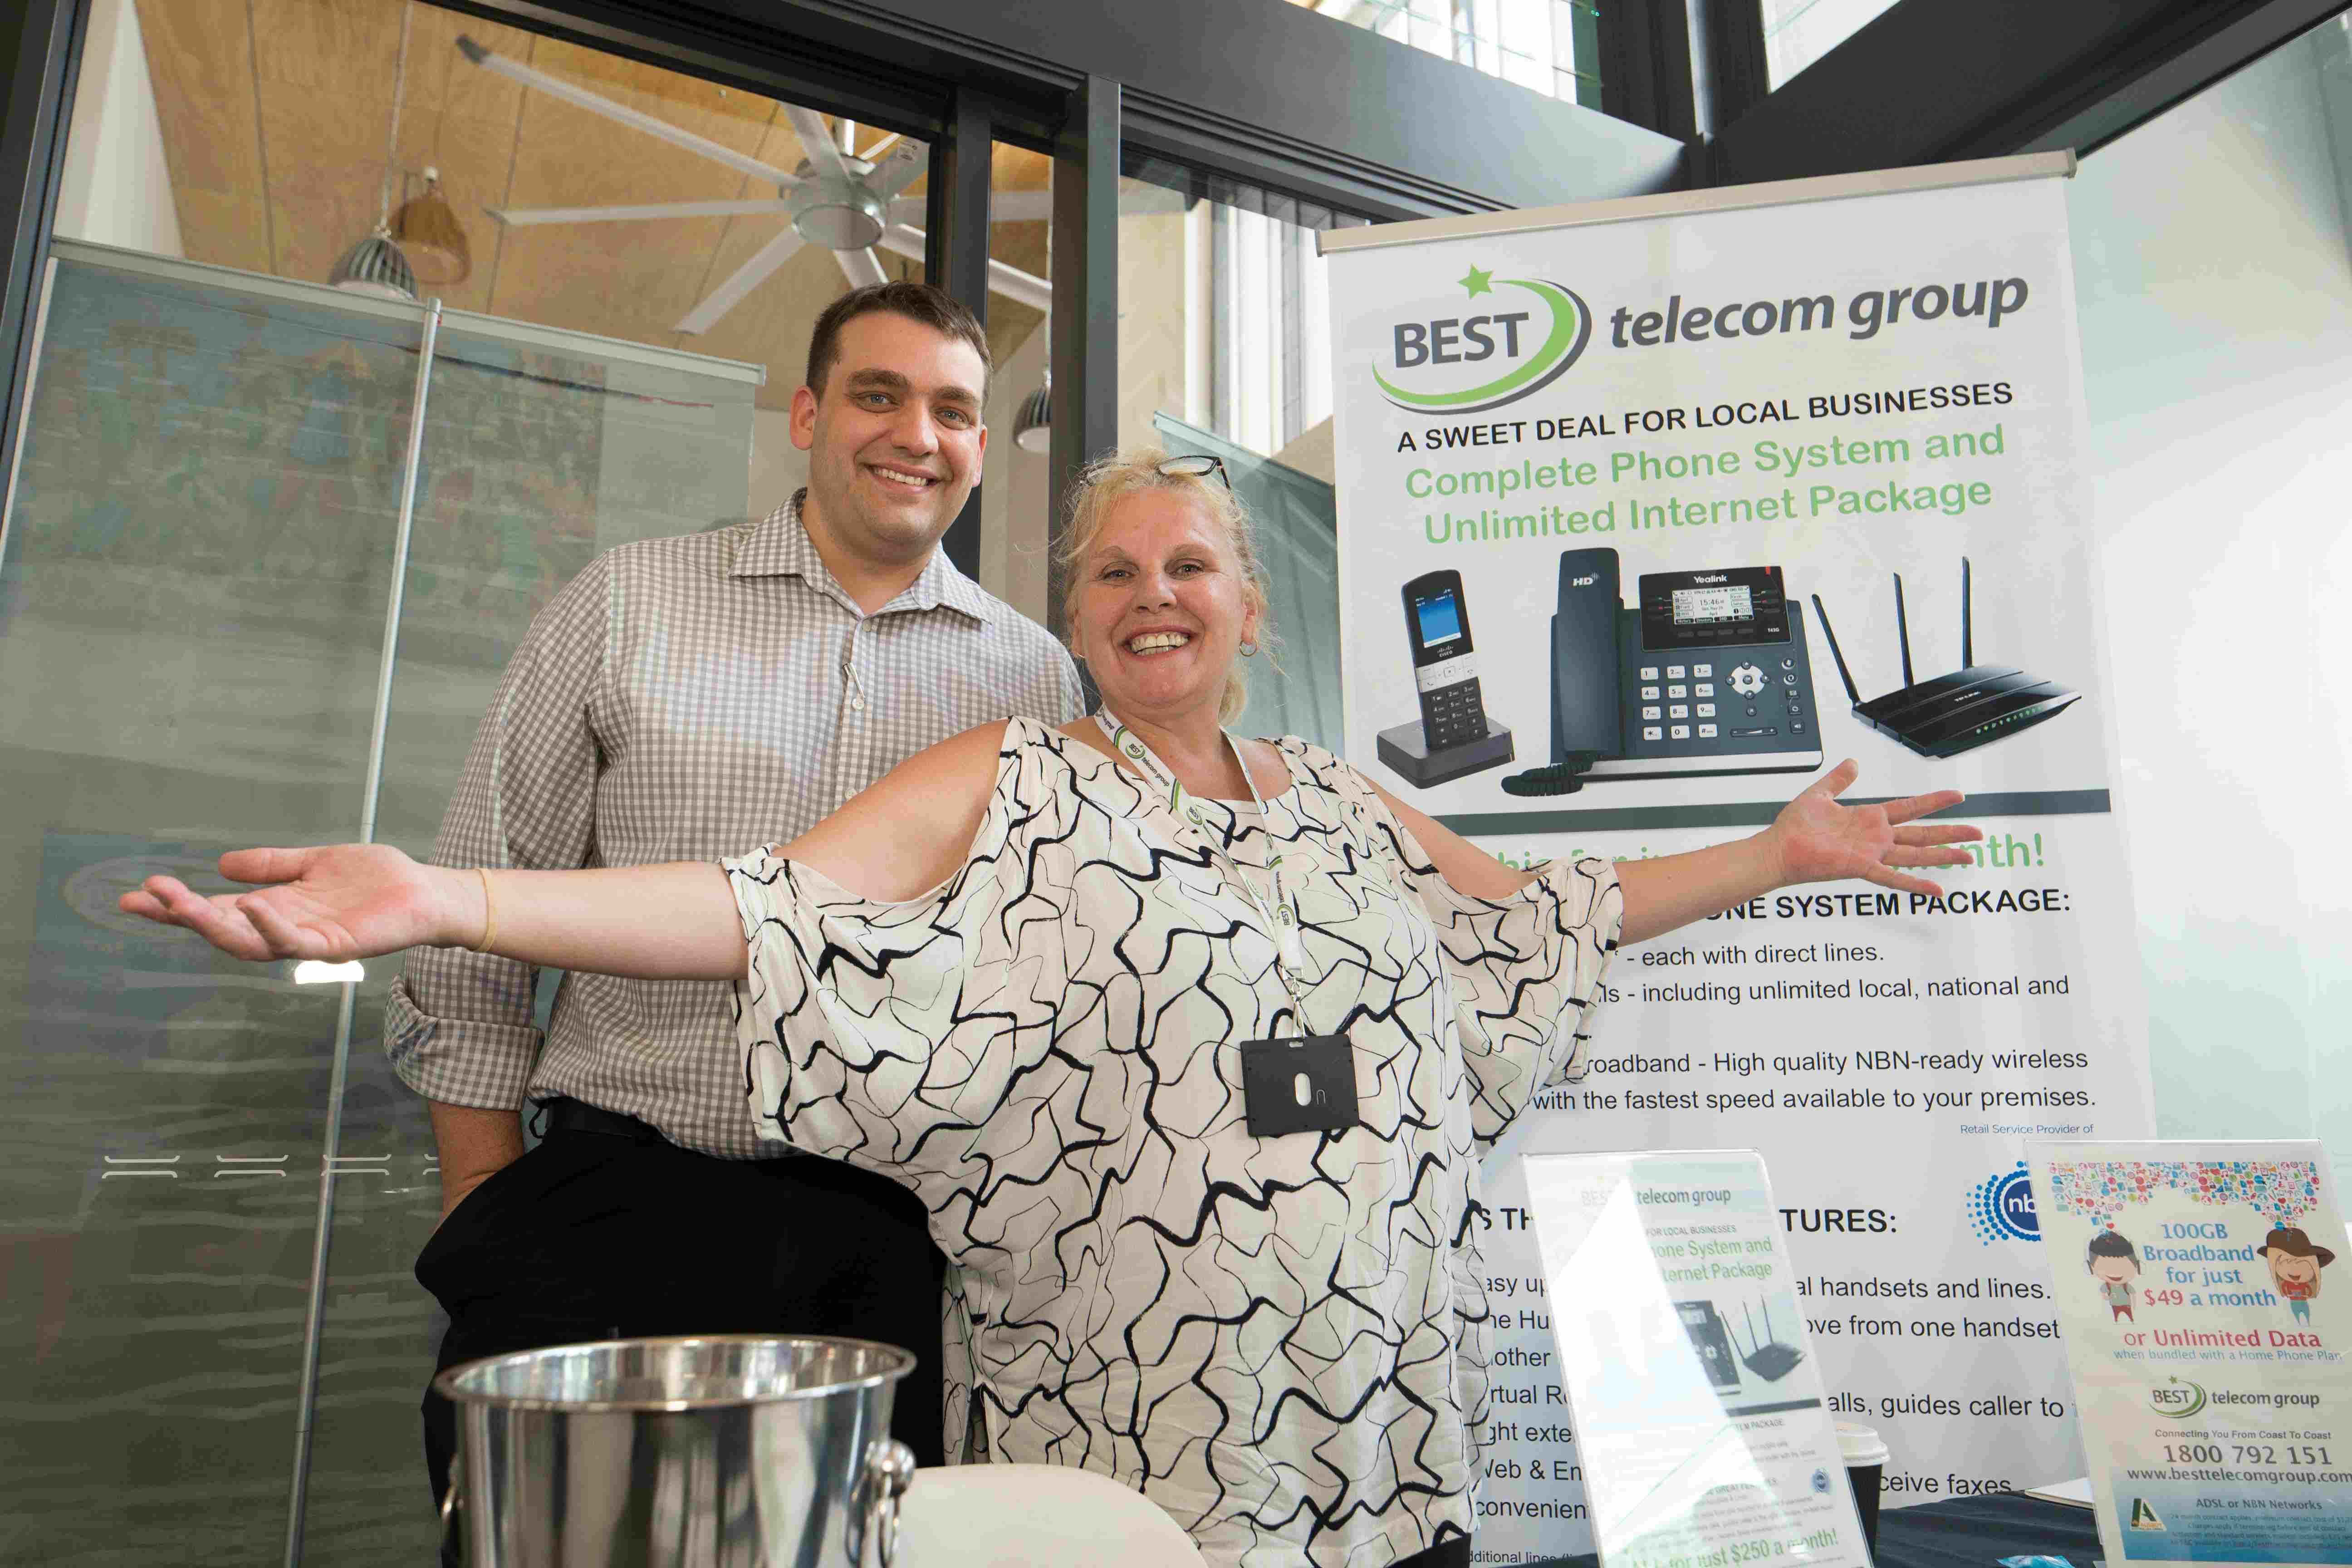 Business Expos   Brisbane   Gold Coast   Small Business Expos    56k9471 Min